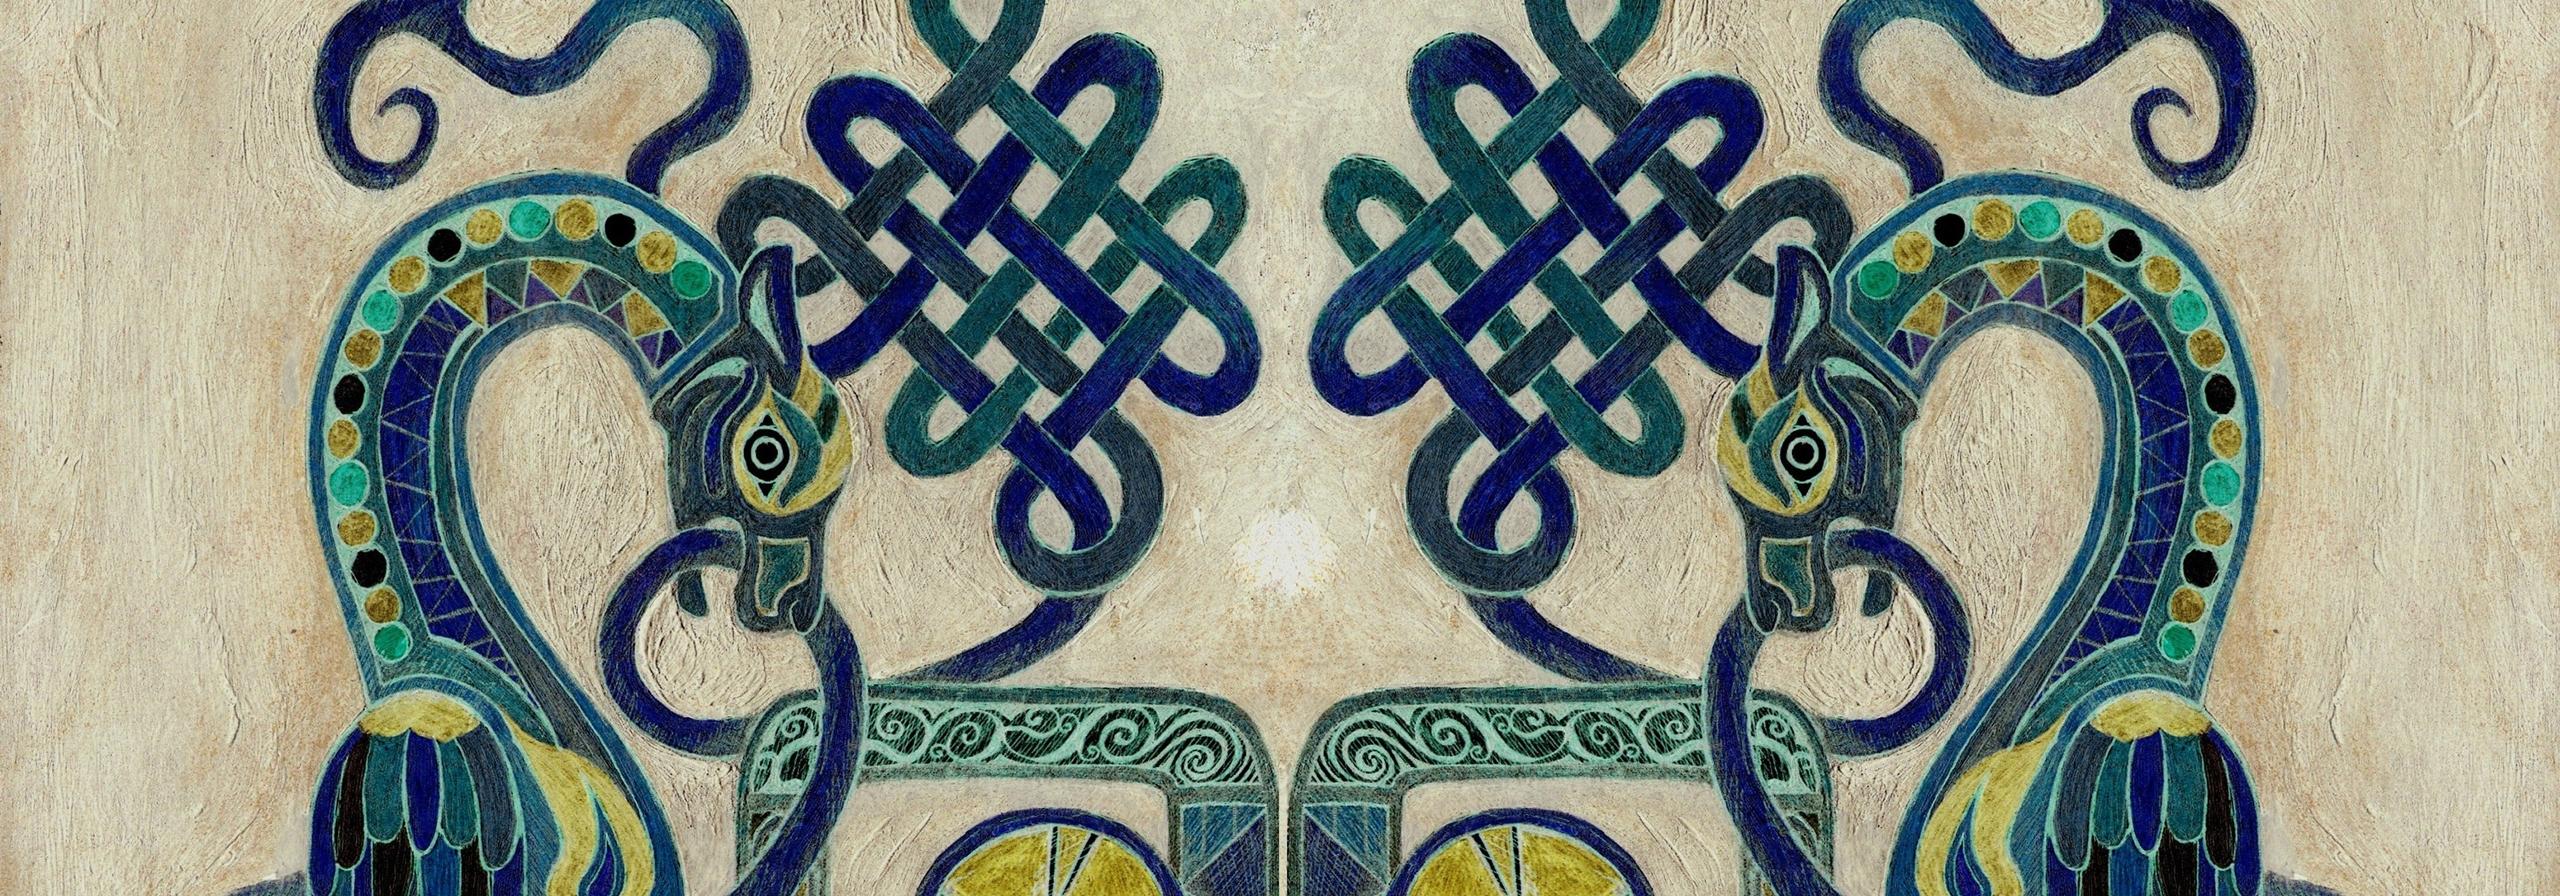 ILex Eco Art (@ilexecoart) Cover Image